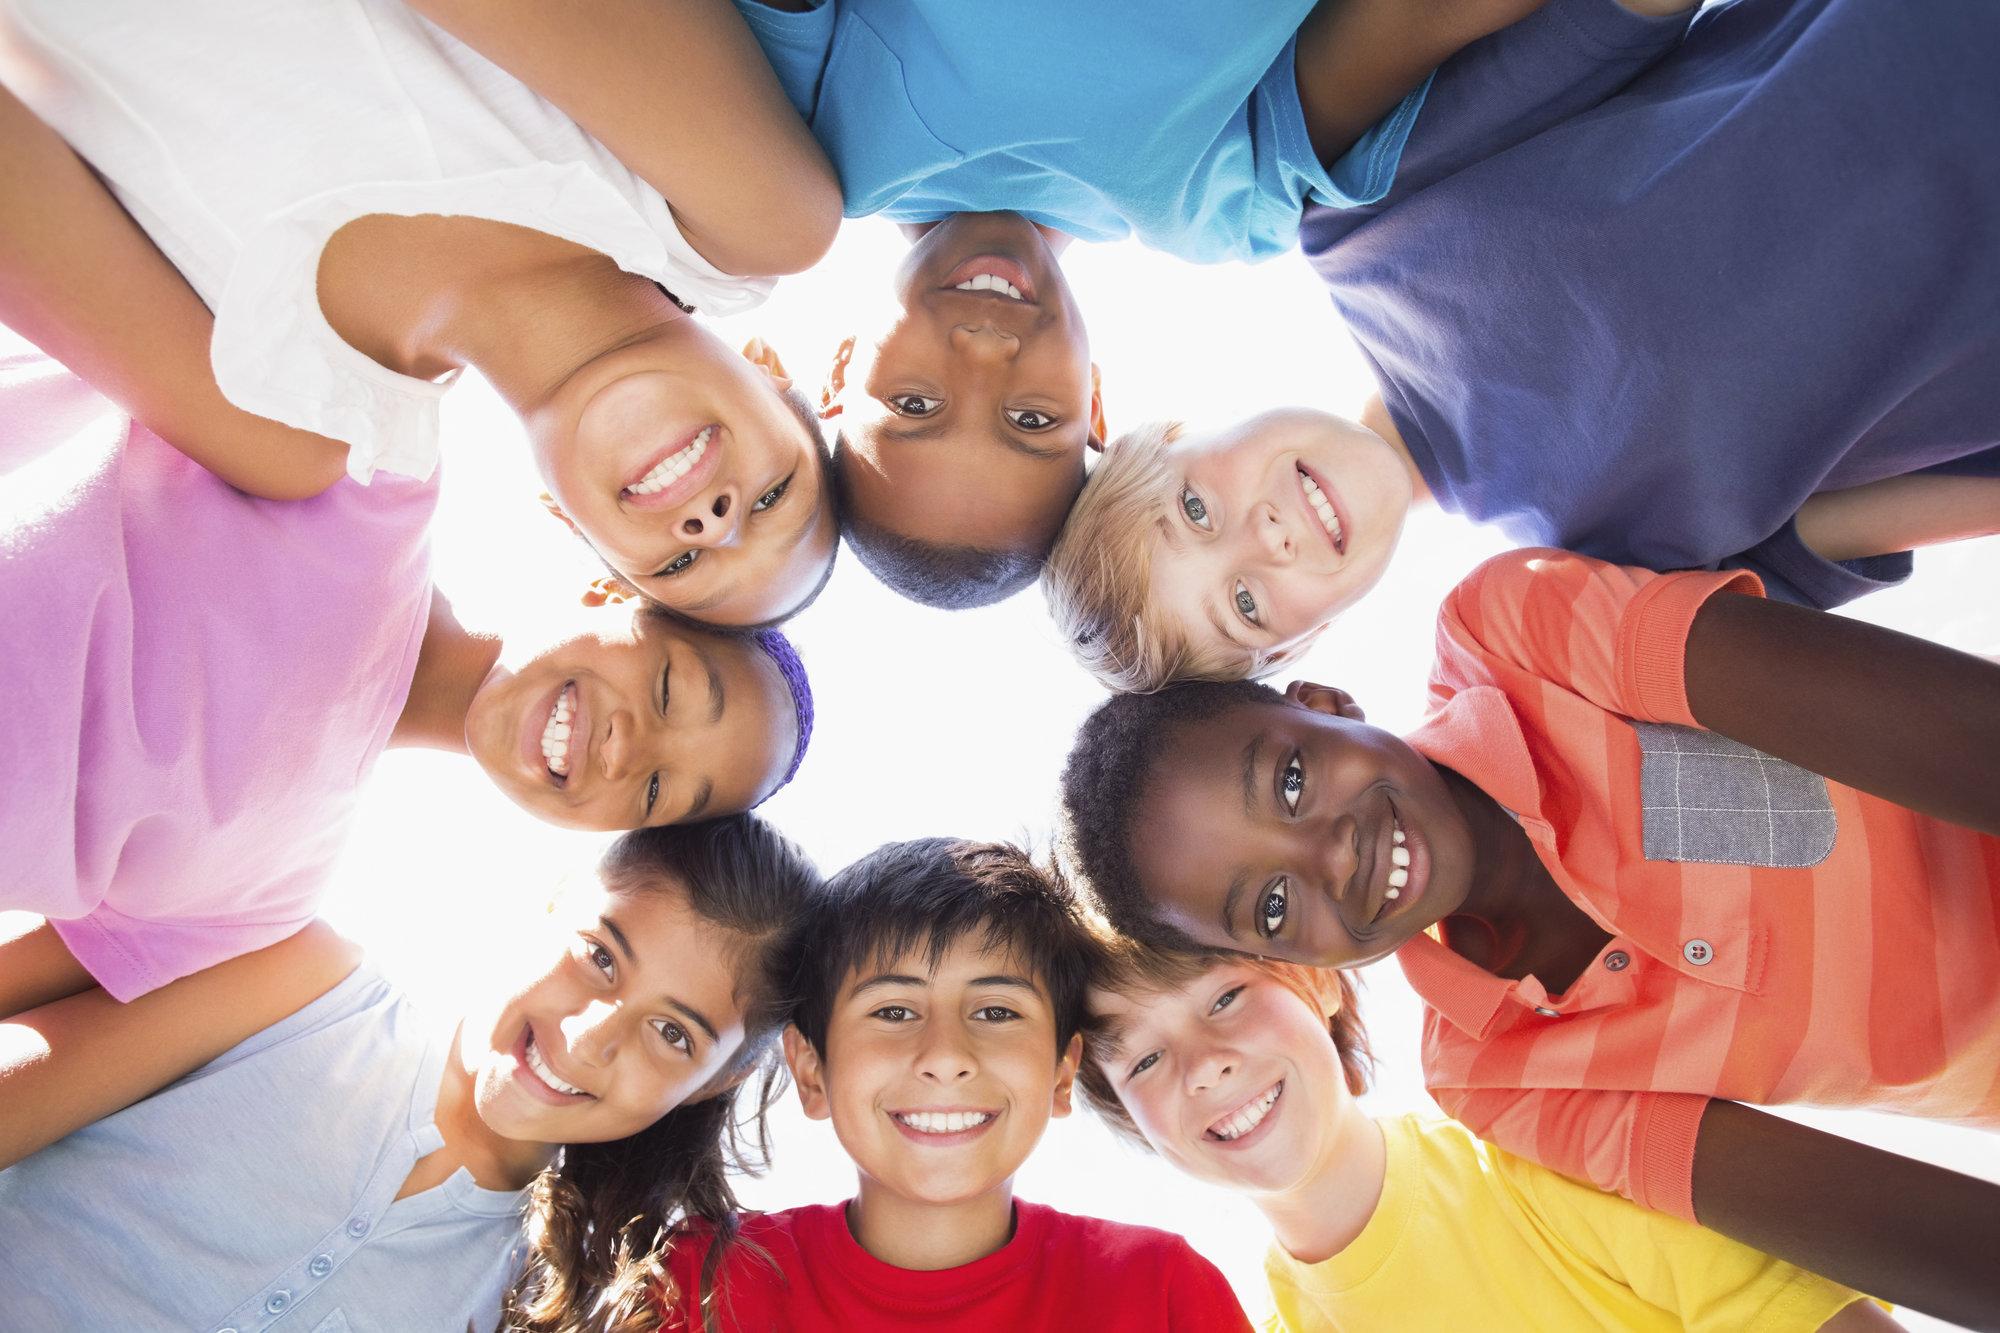 Coping Skills Webinar Exploring And Managing Emotions